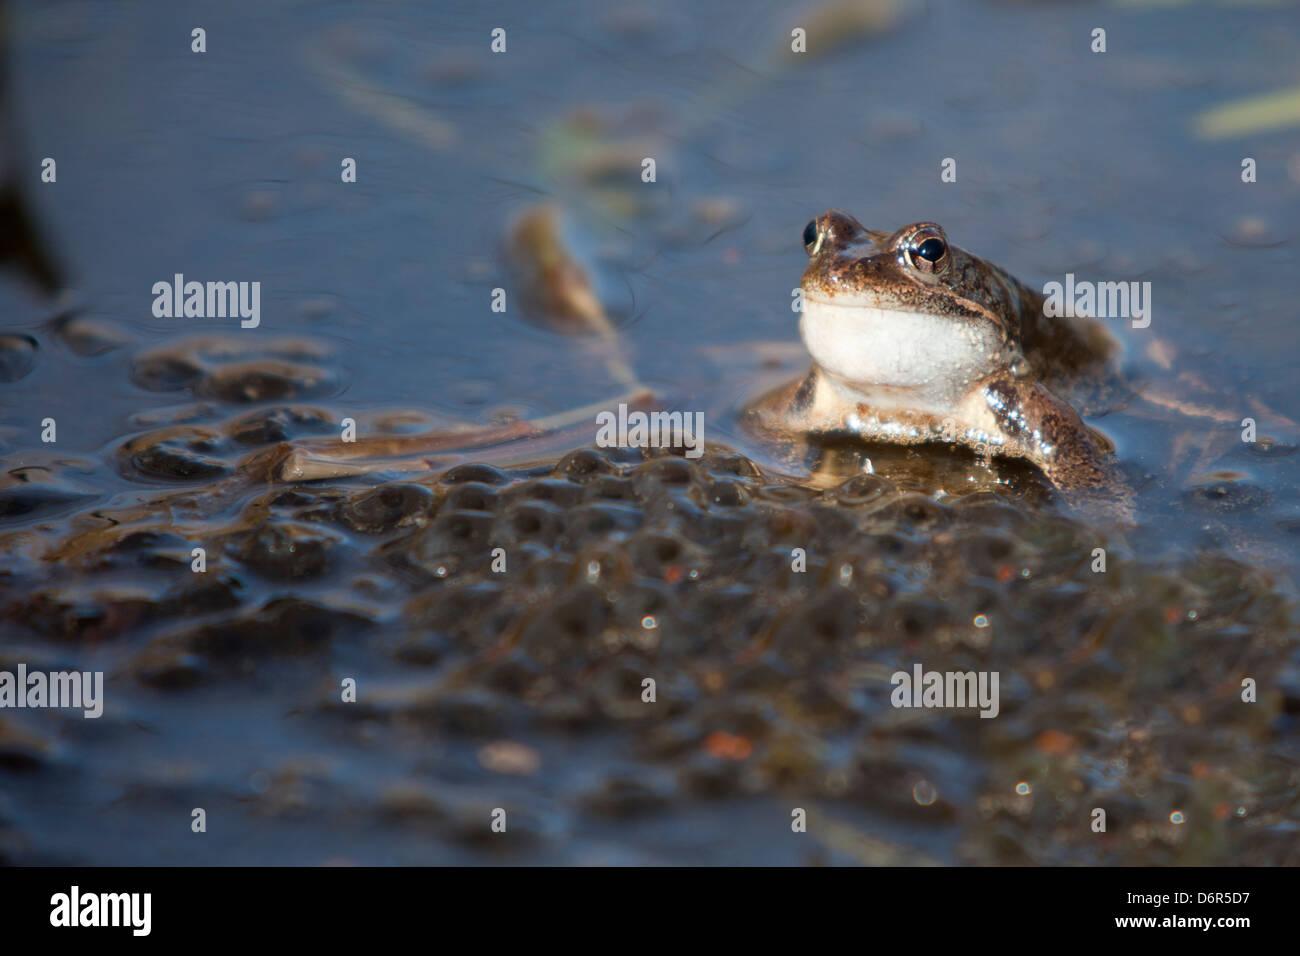 European Common Frog or European Common Brown Frog - Rana Temporaria -, Barcelona, Spain - Stock Image